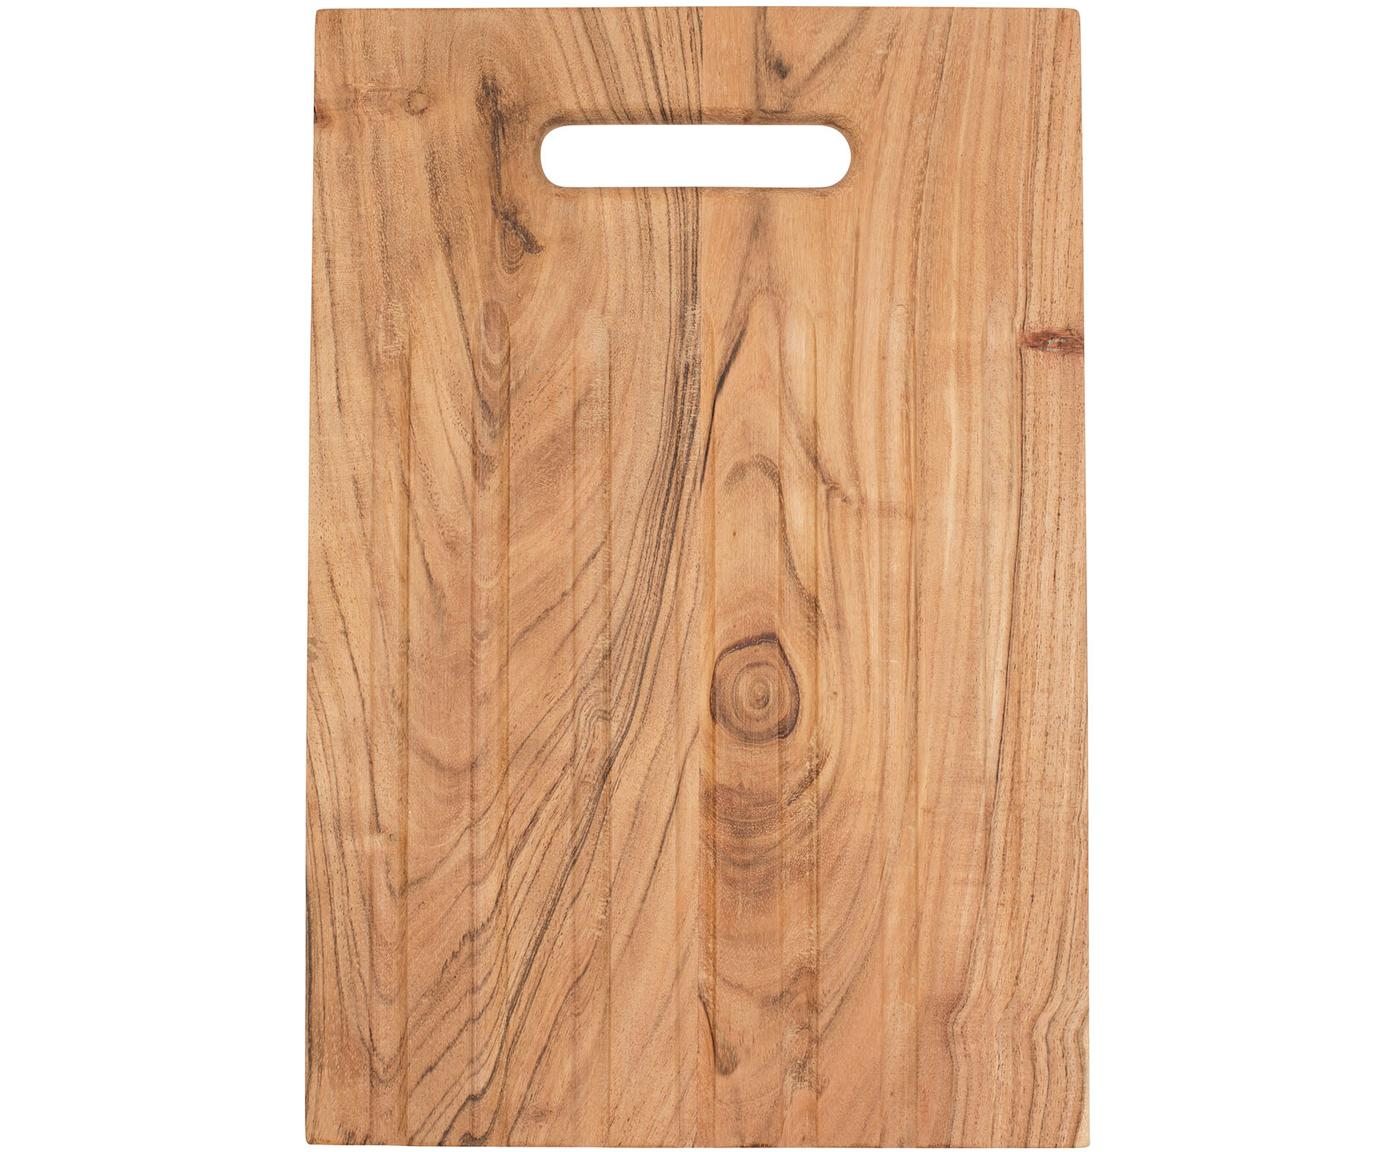 Snijplank Bert, Acaciahout, Acaciahoutkleurig, B 38 x D 25 cm